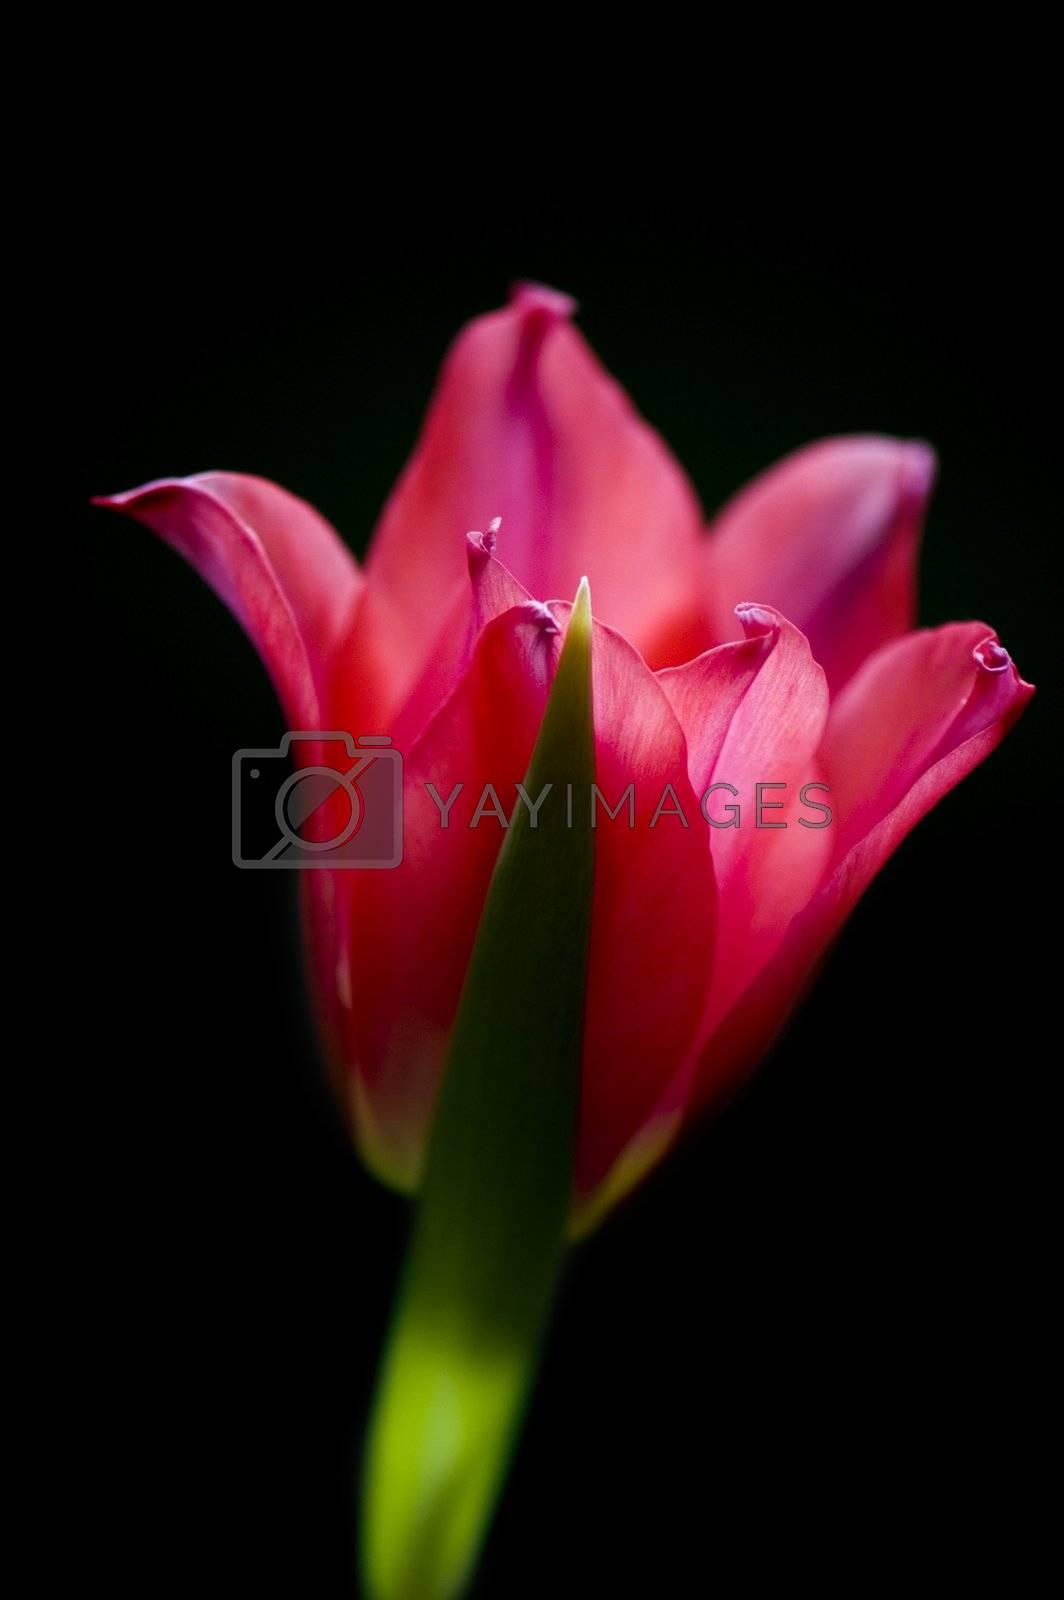 Scarlet tulip on a black background